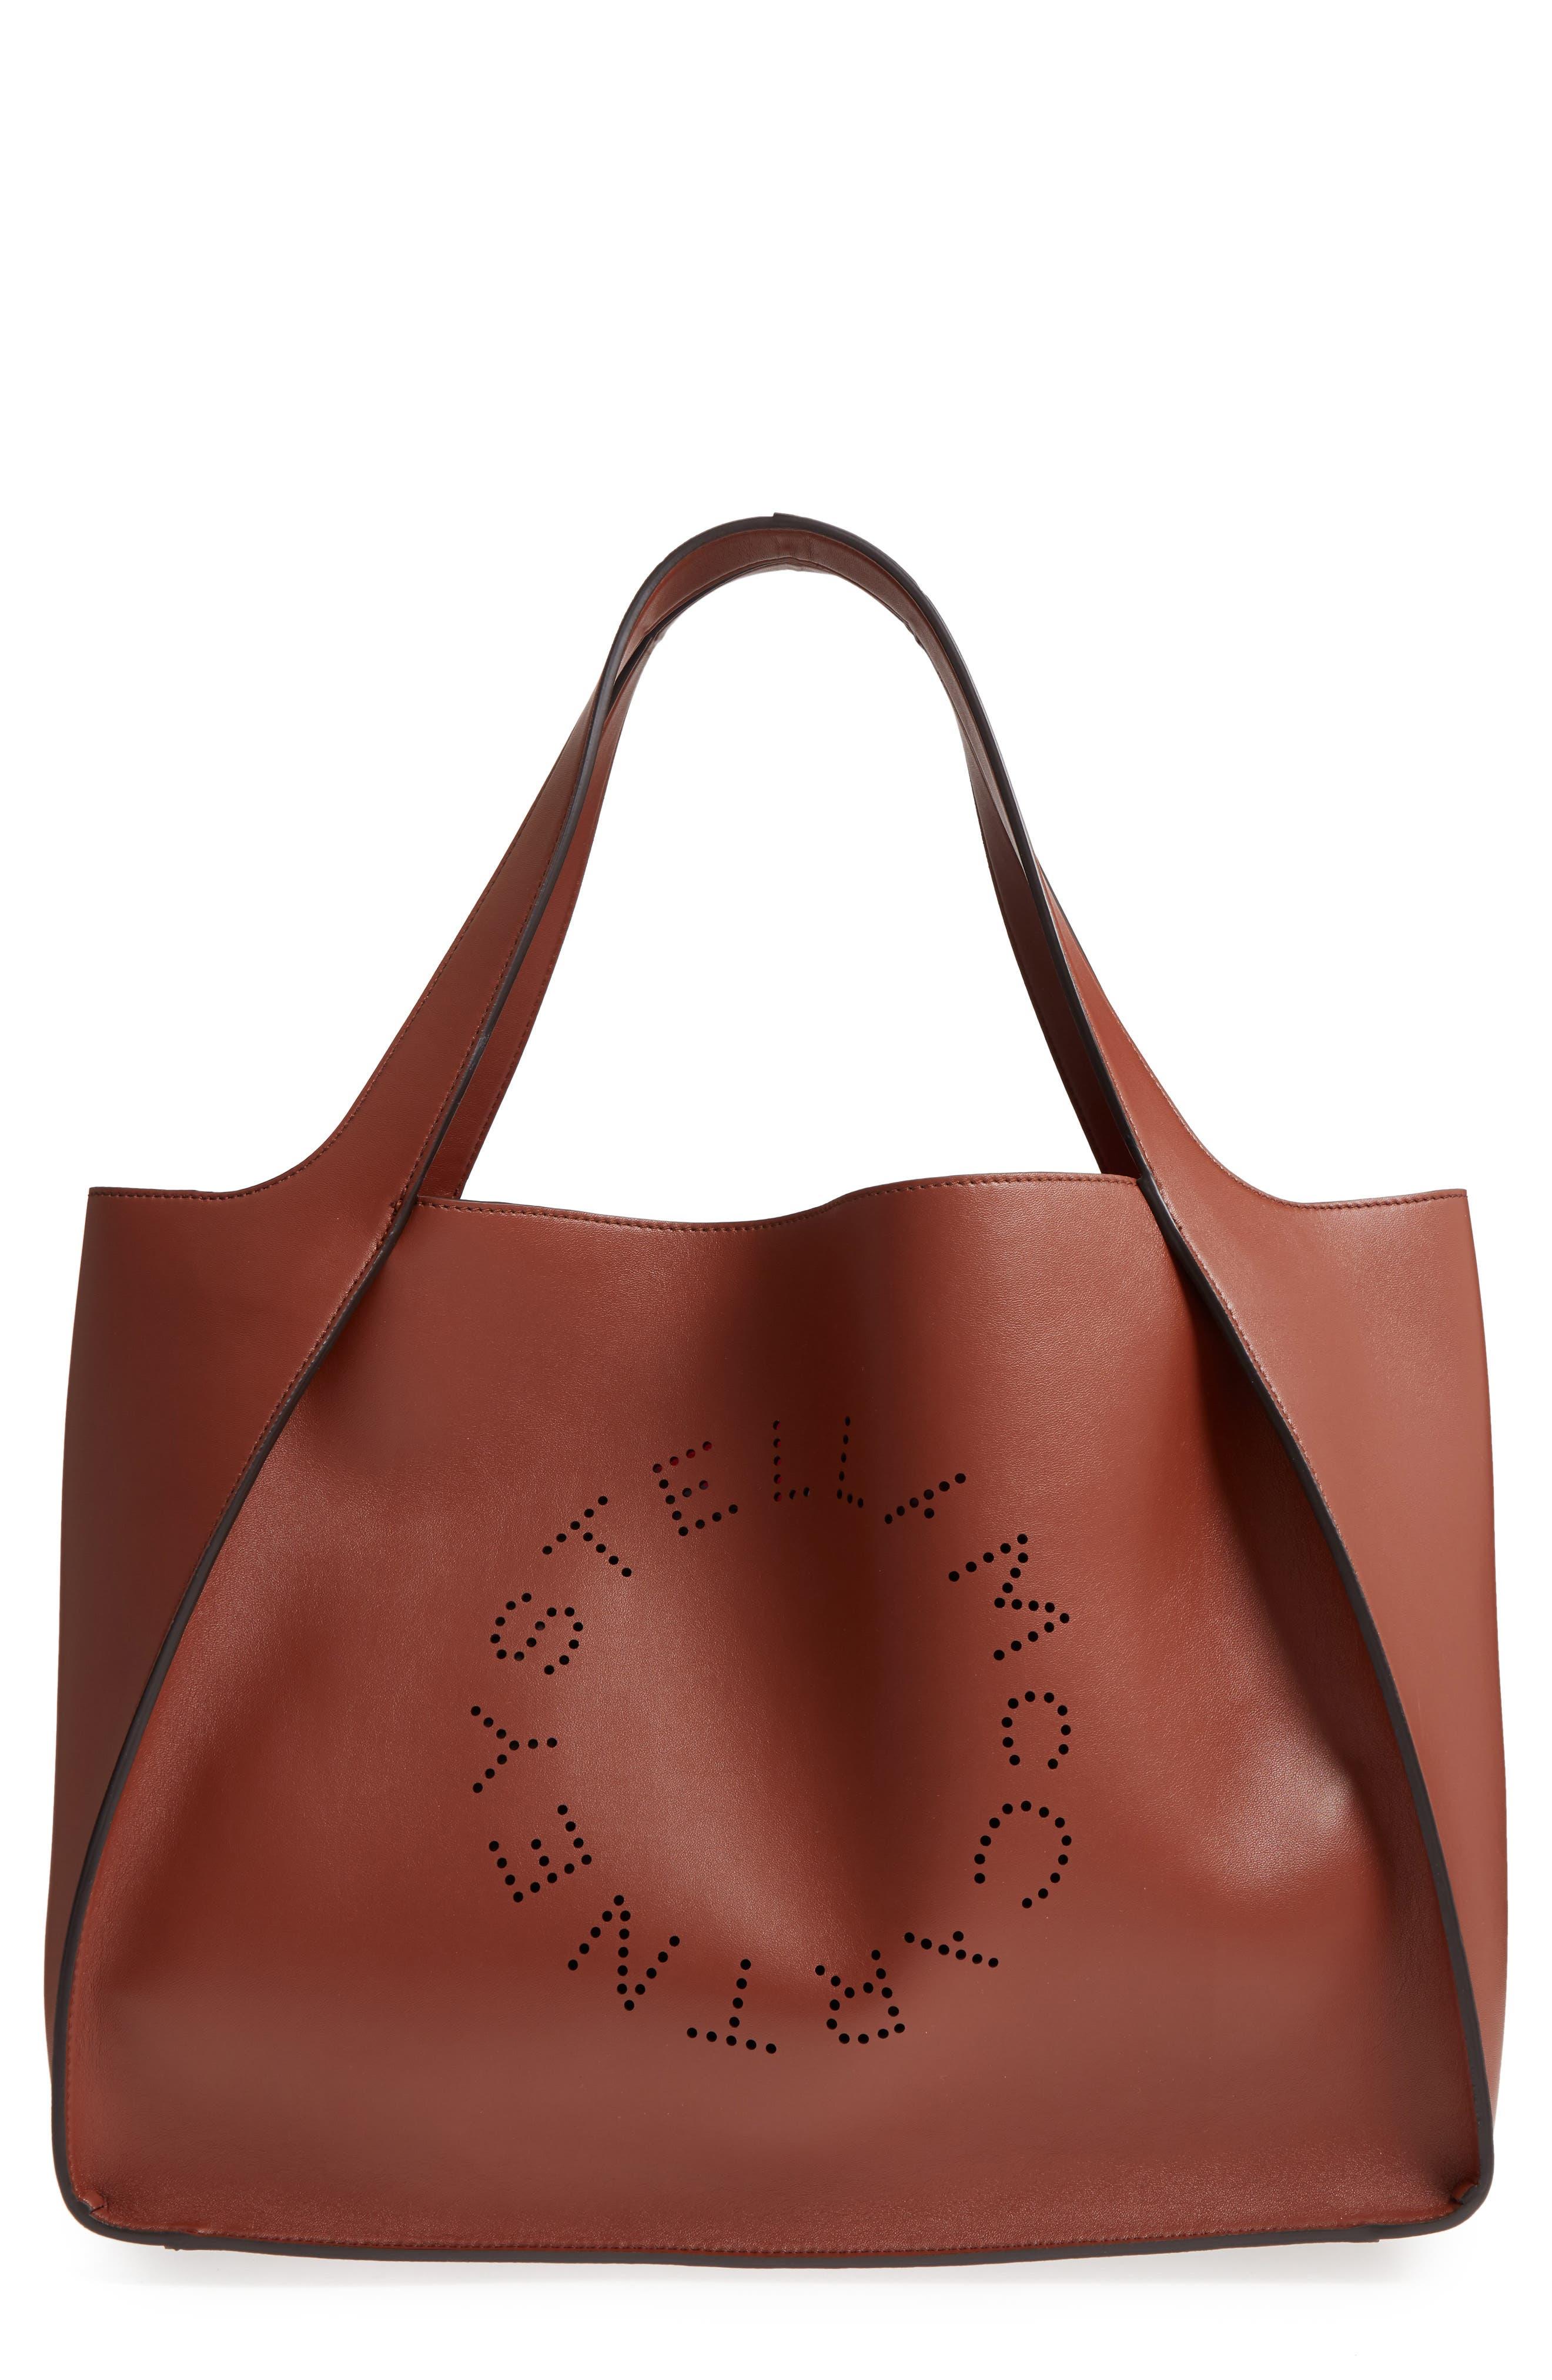 17c37de30249 Stella Mccartney Tote Bags for Women  Leather